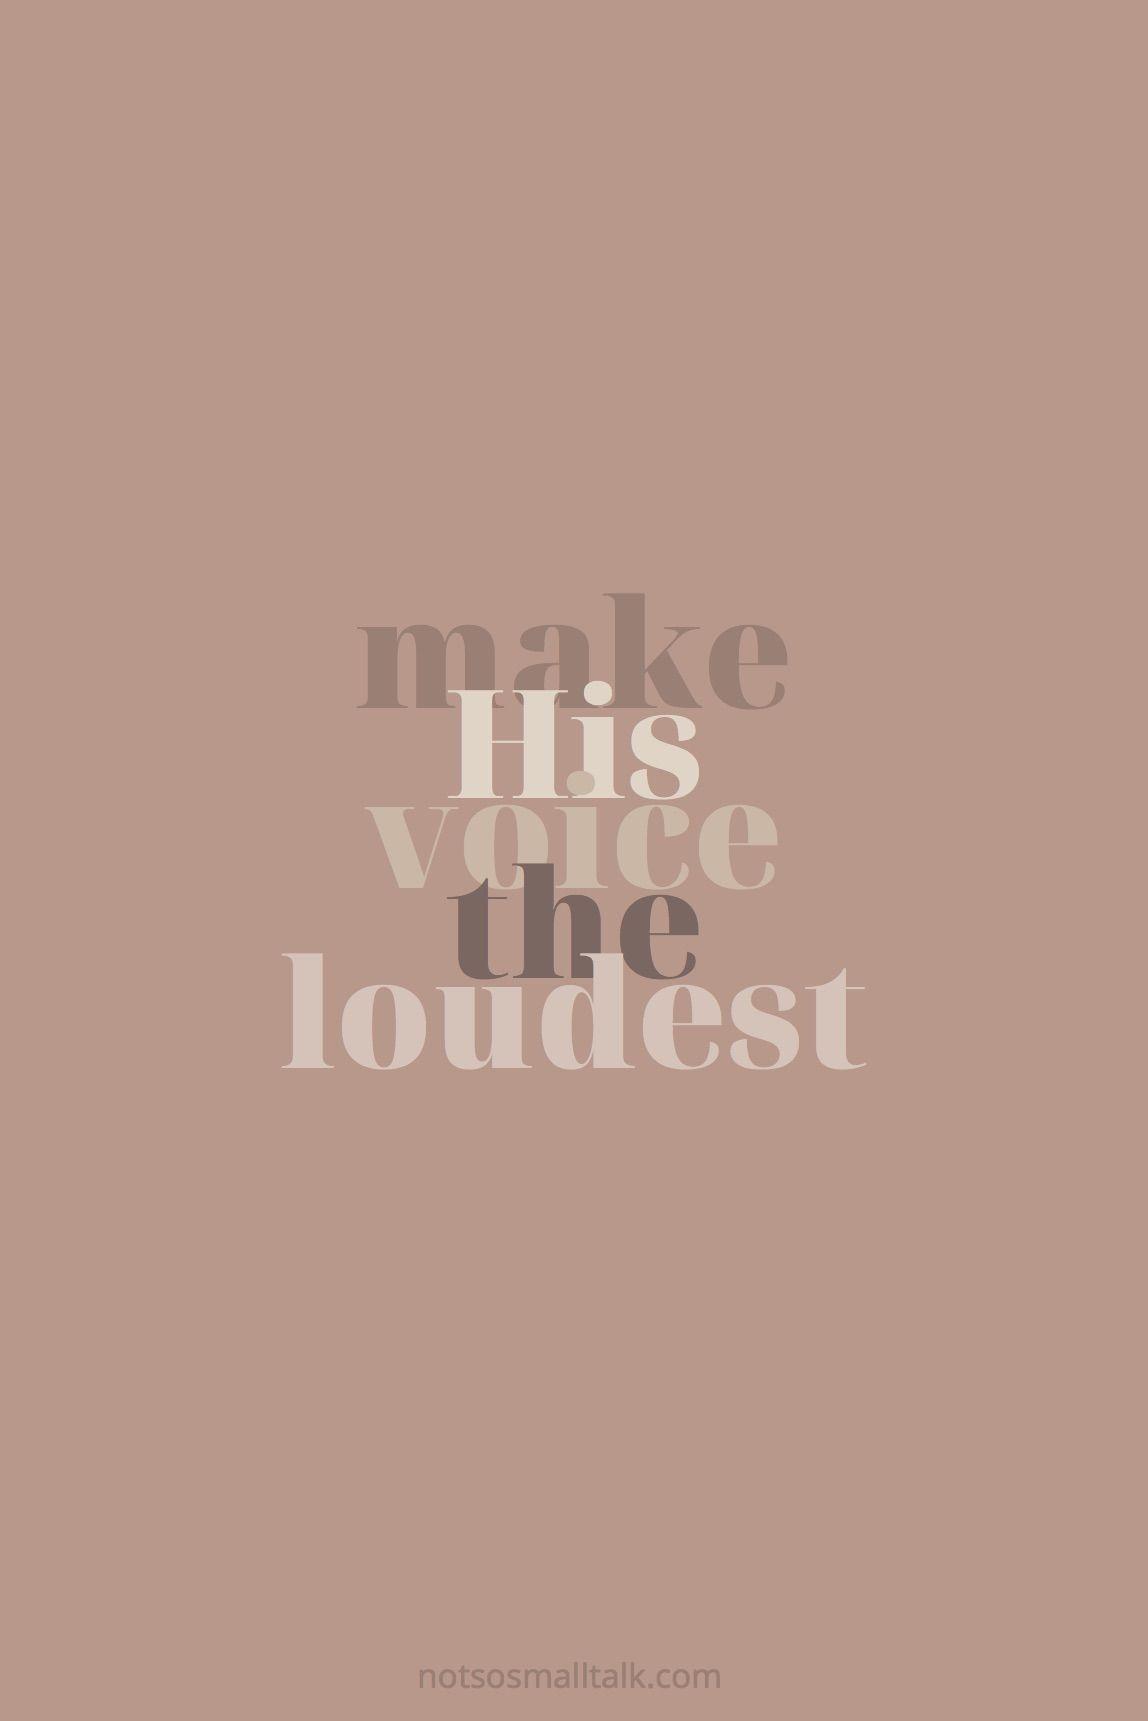 Focus on His Voice